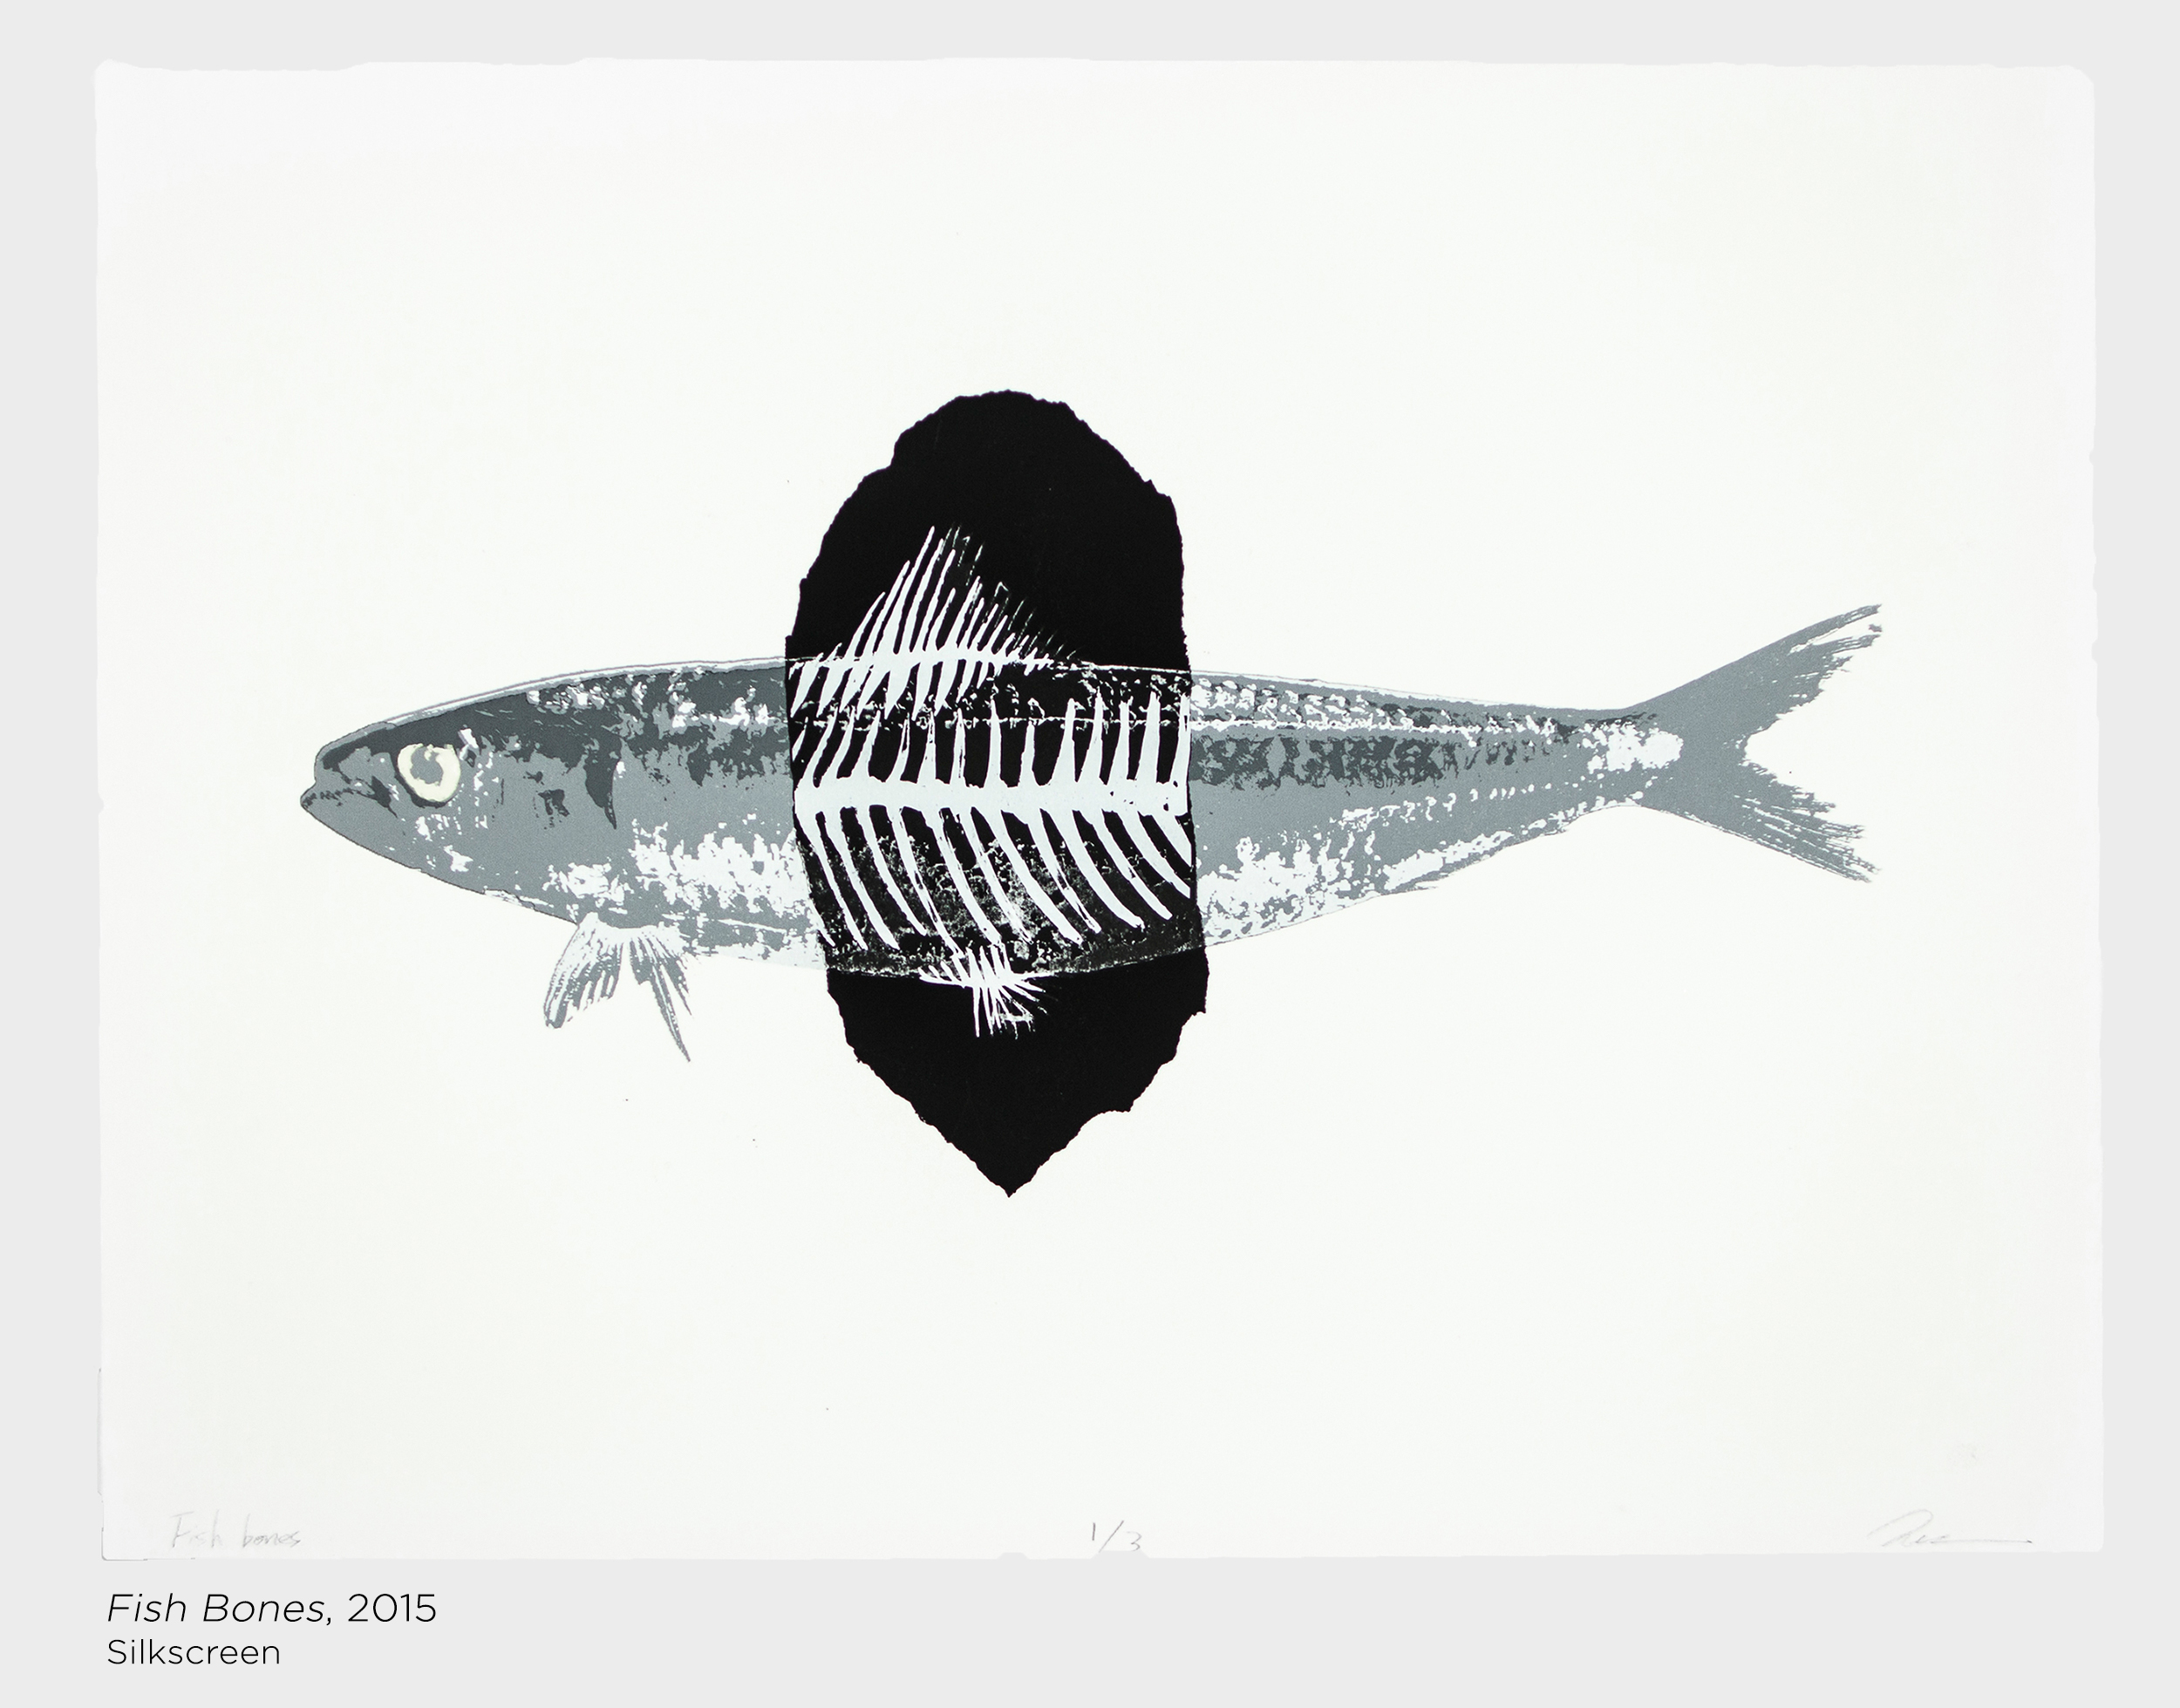 fish bone-1Ff.jpg